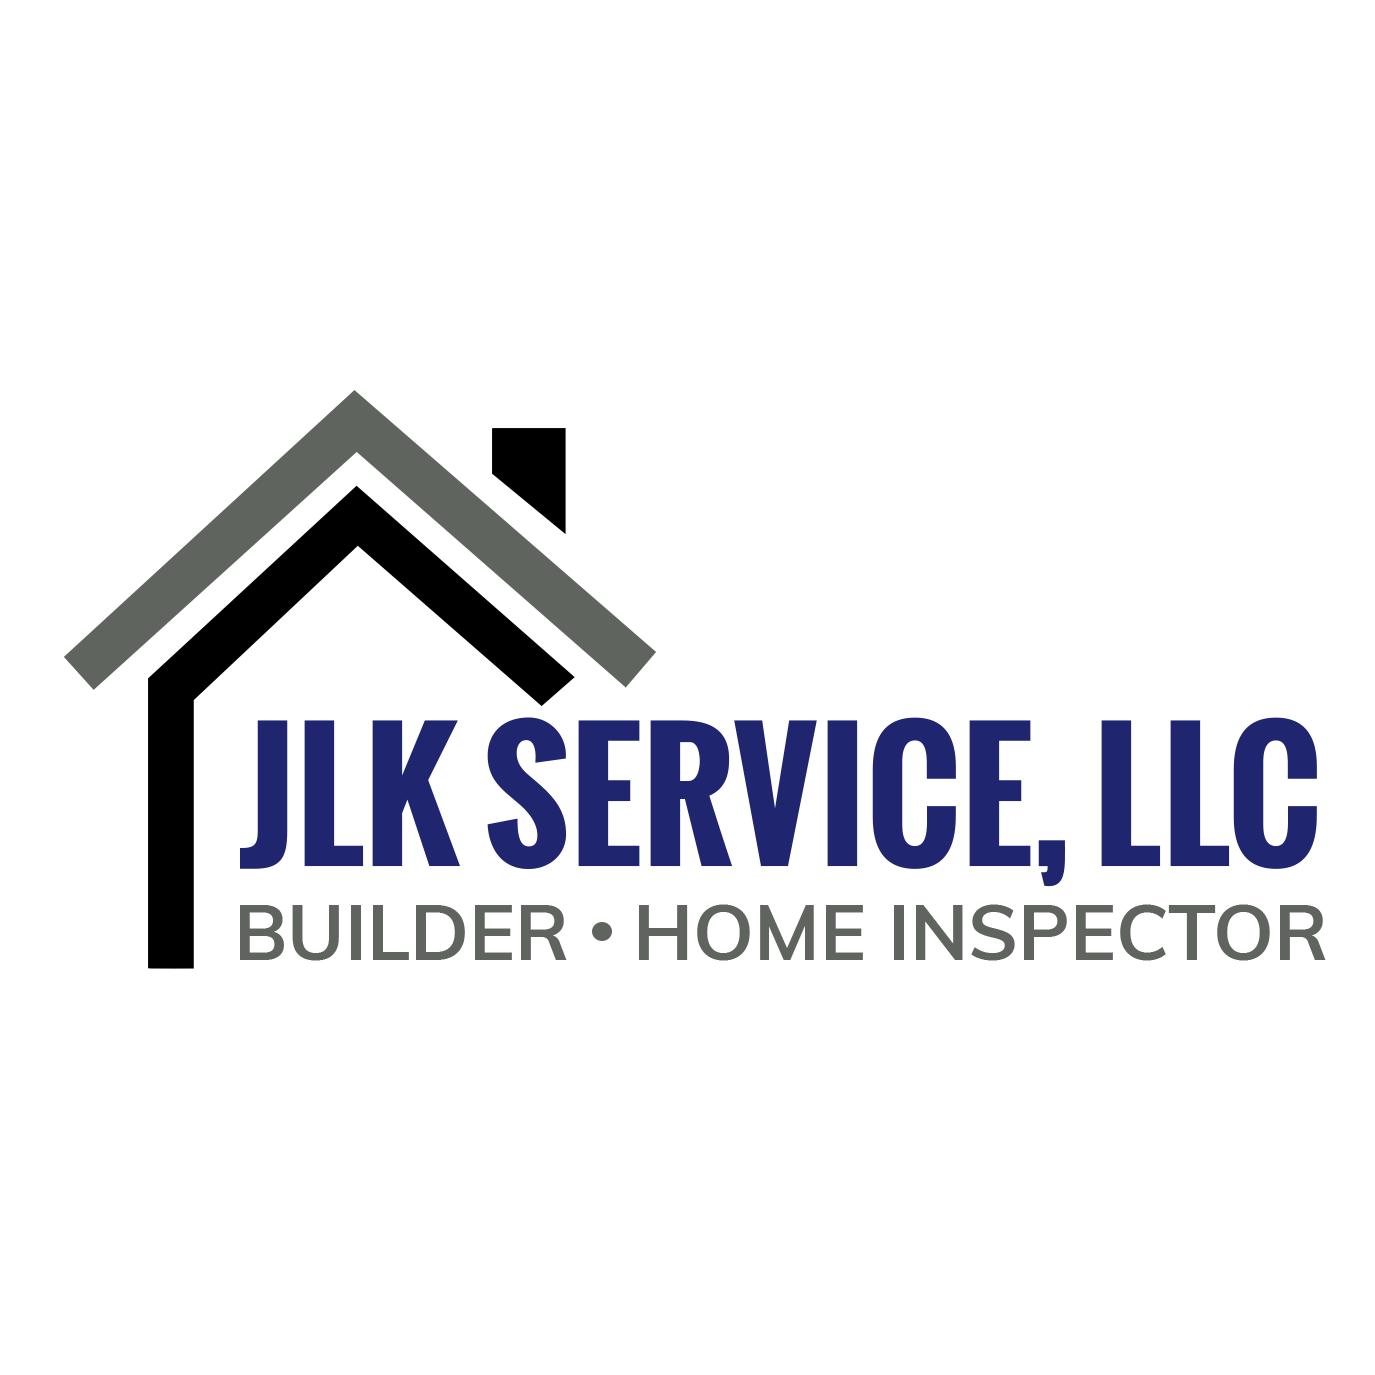 JLK Service, LLC - Davison, MI 48423 - (810)869-4526 | ShowMeLocal.com